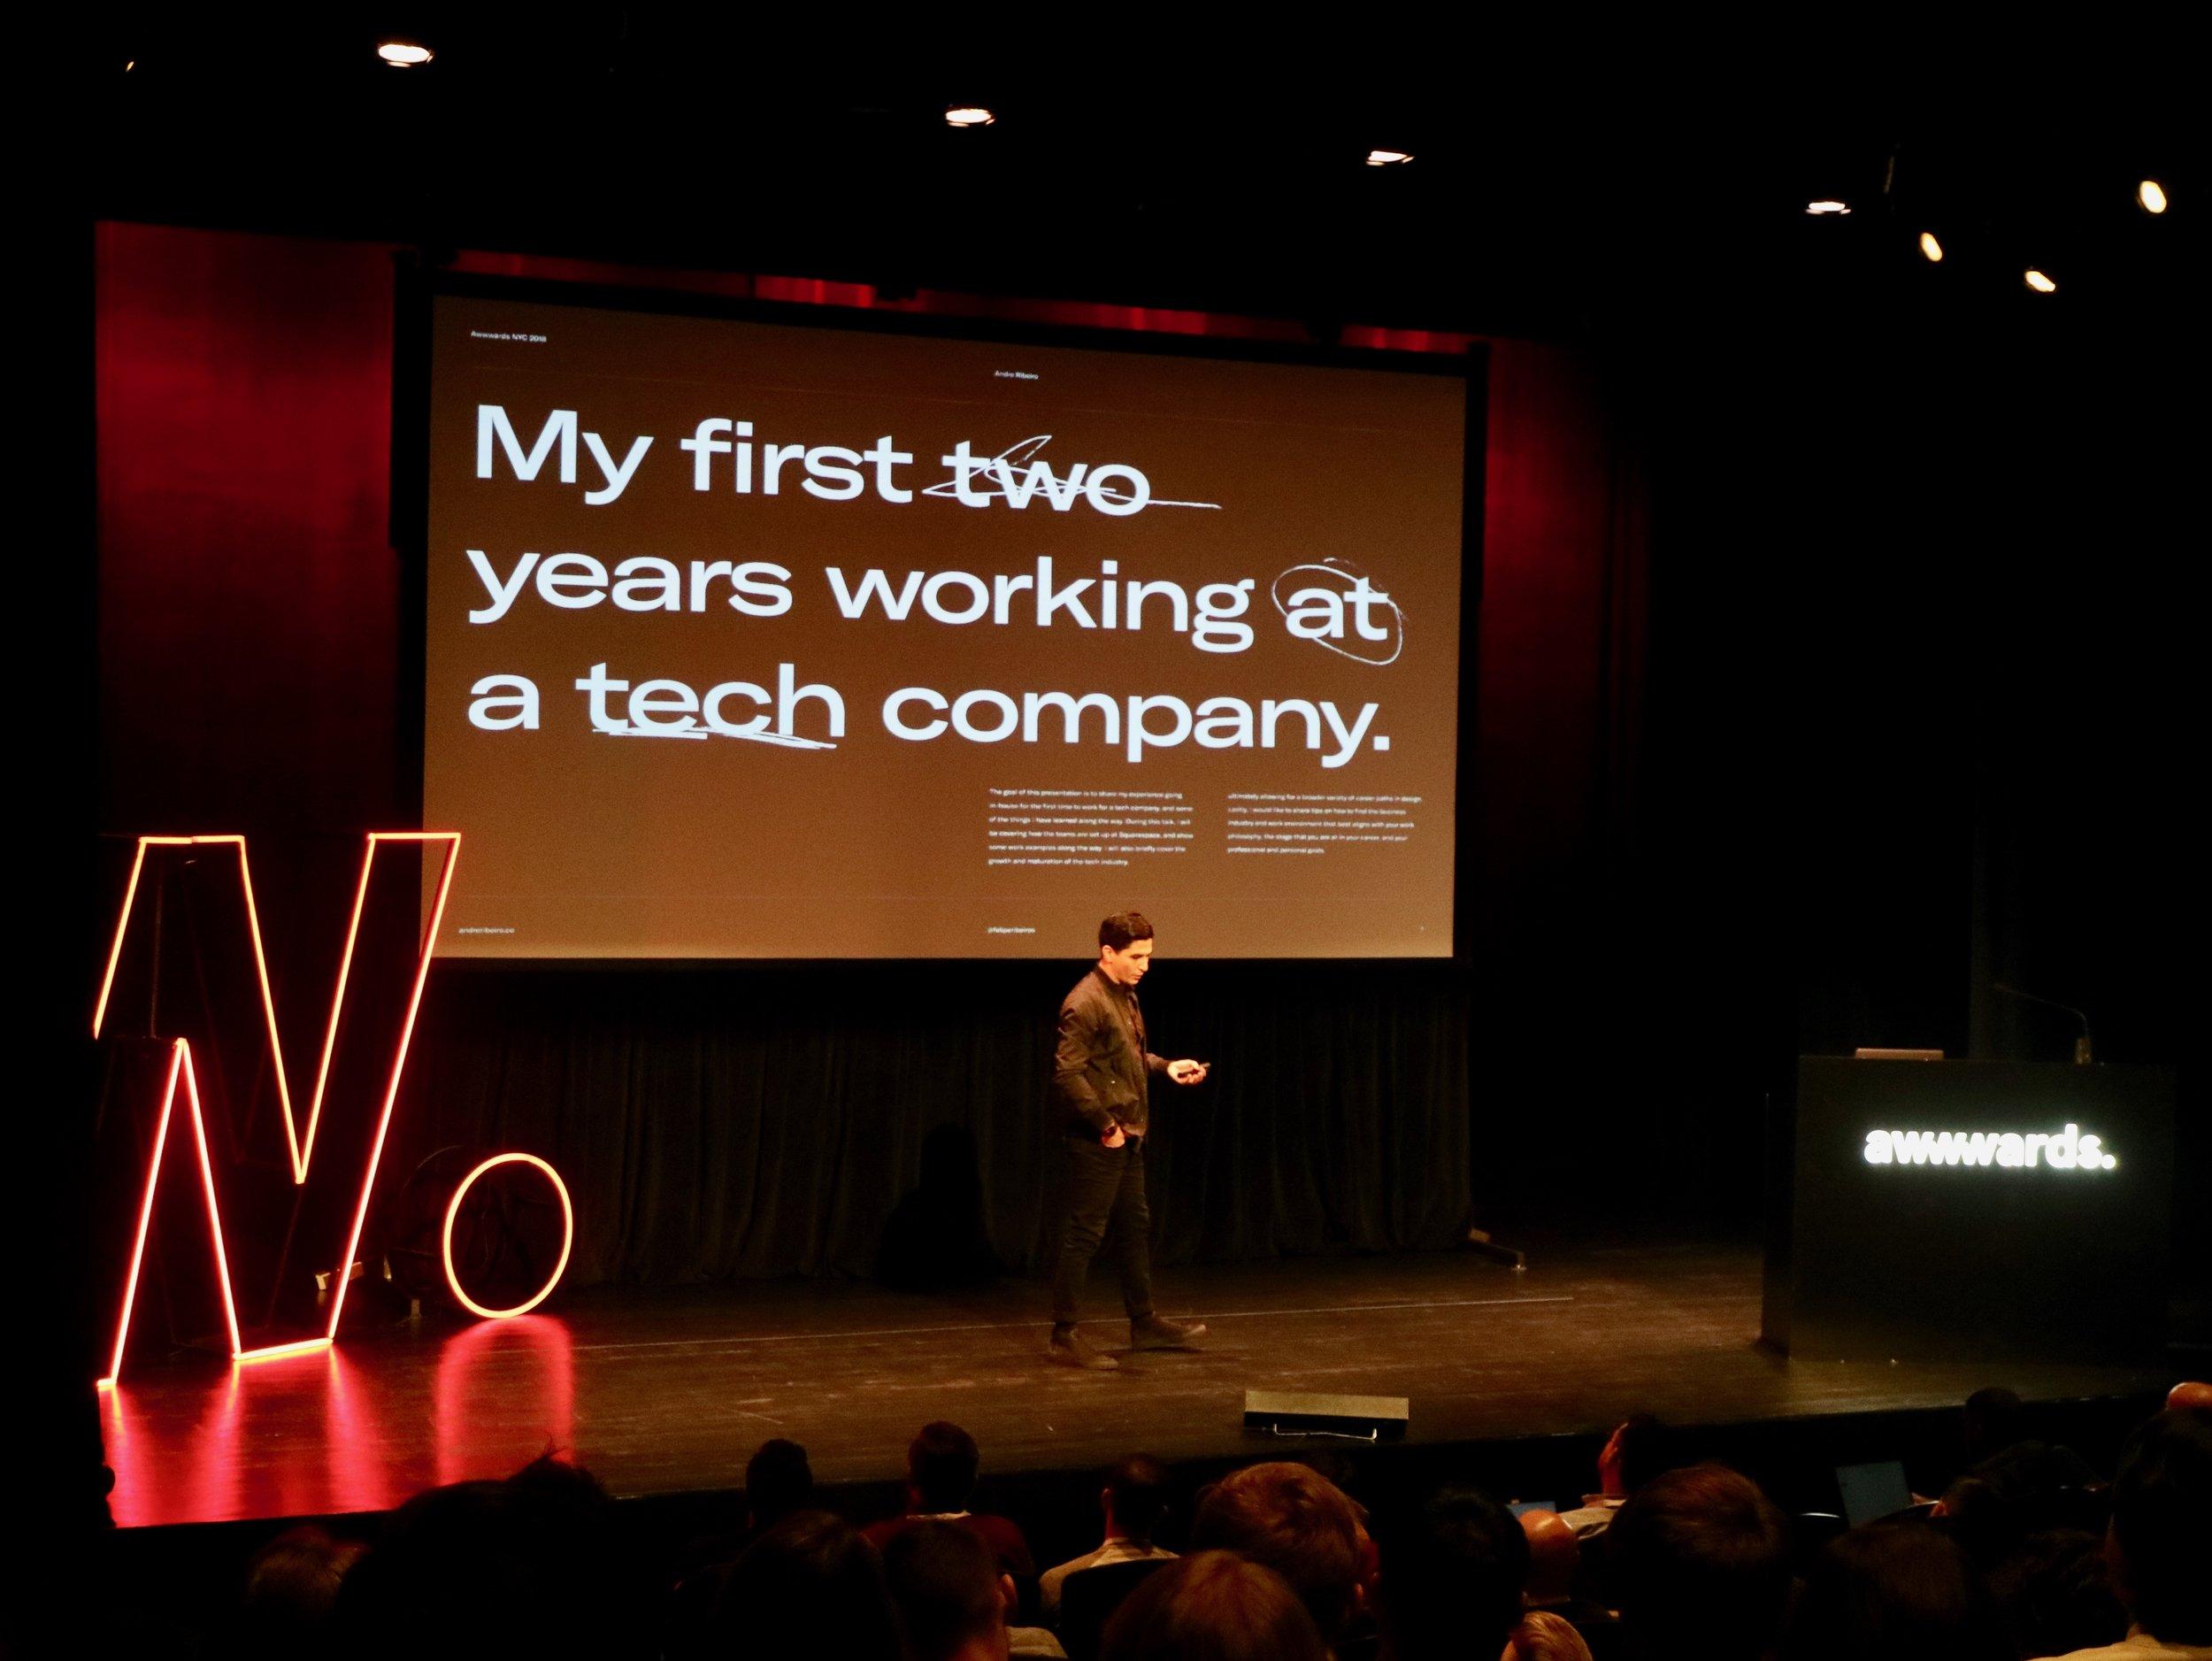 Squarespace的Design Manager Andre Felipe Ribeiro 跟大家分享他加入In-house團隊兩年後的心得,